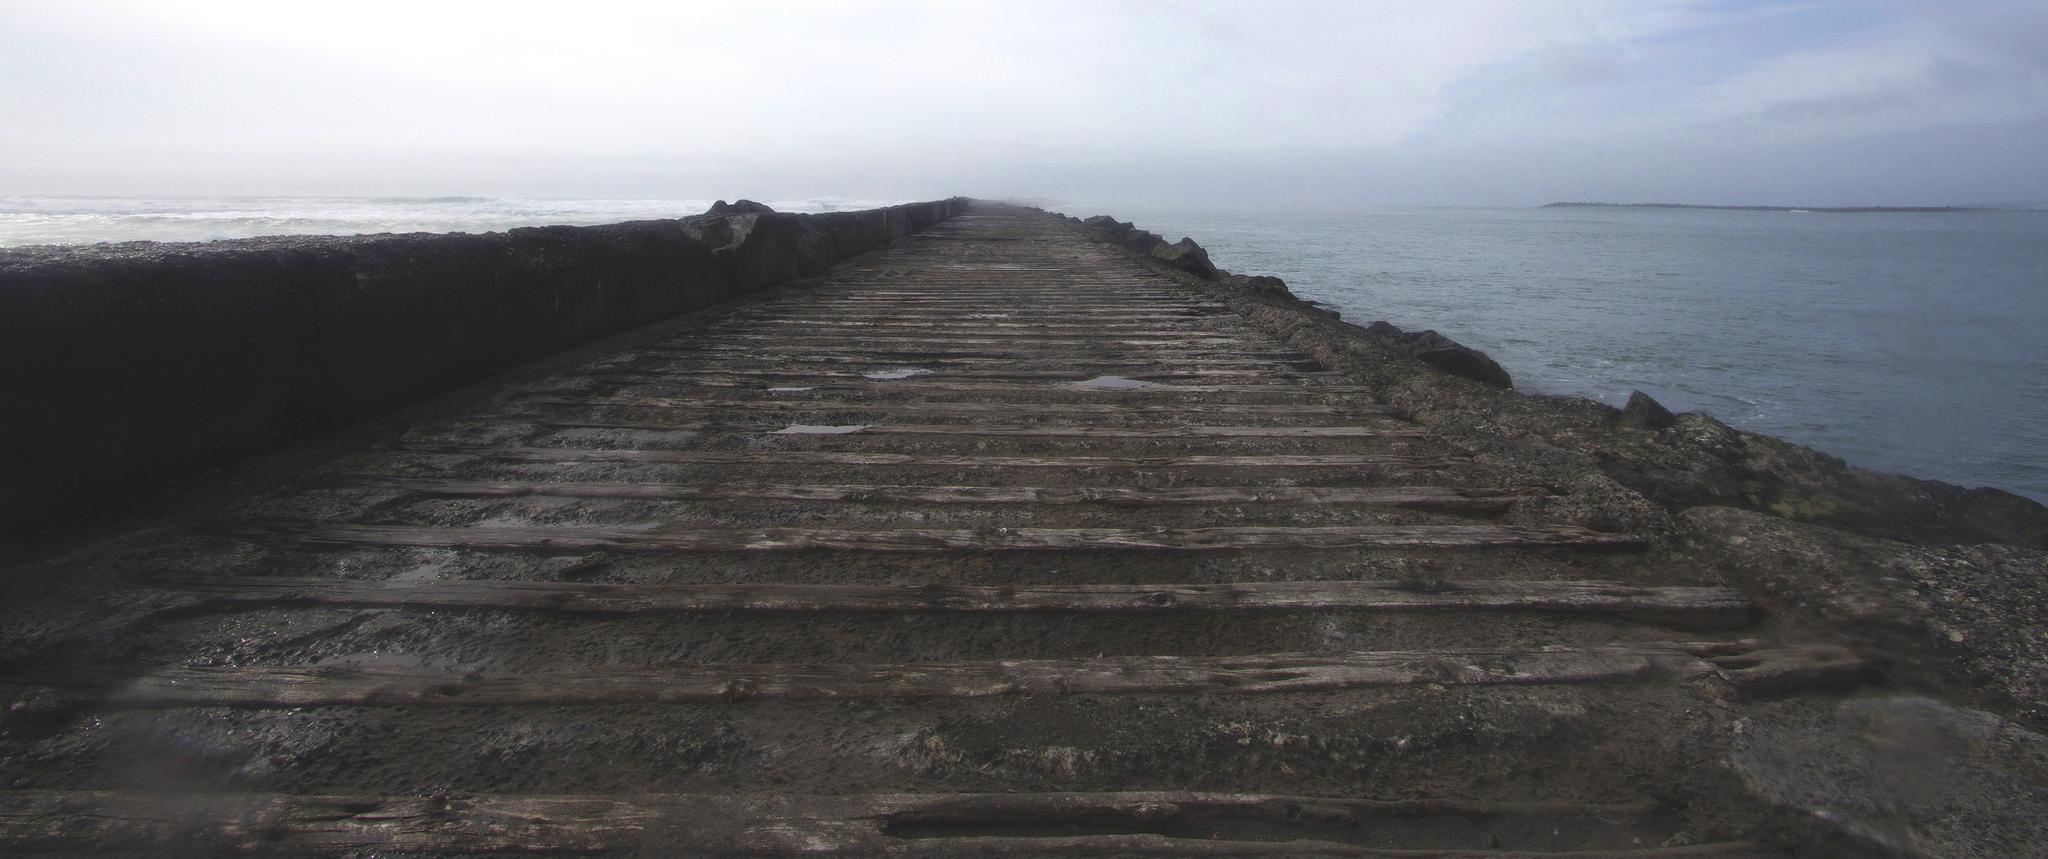 South Jetty - Humboldt Bay, CA